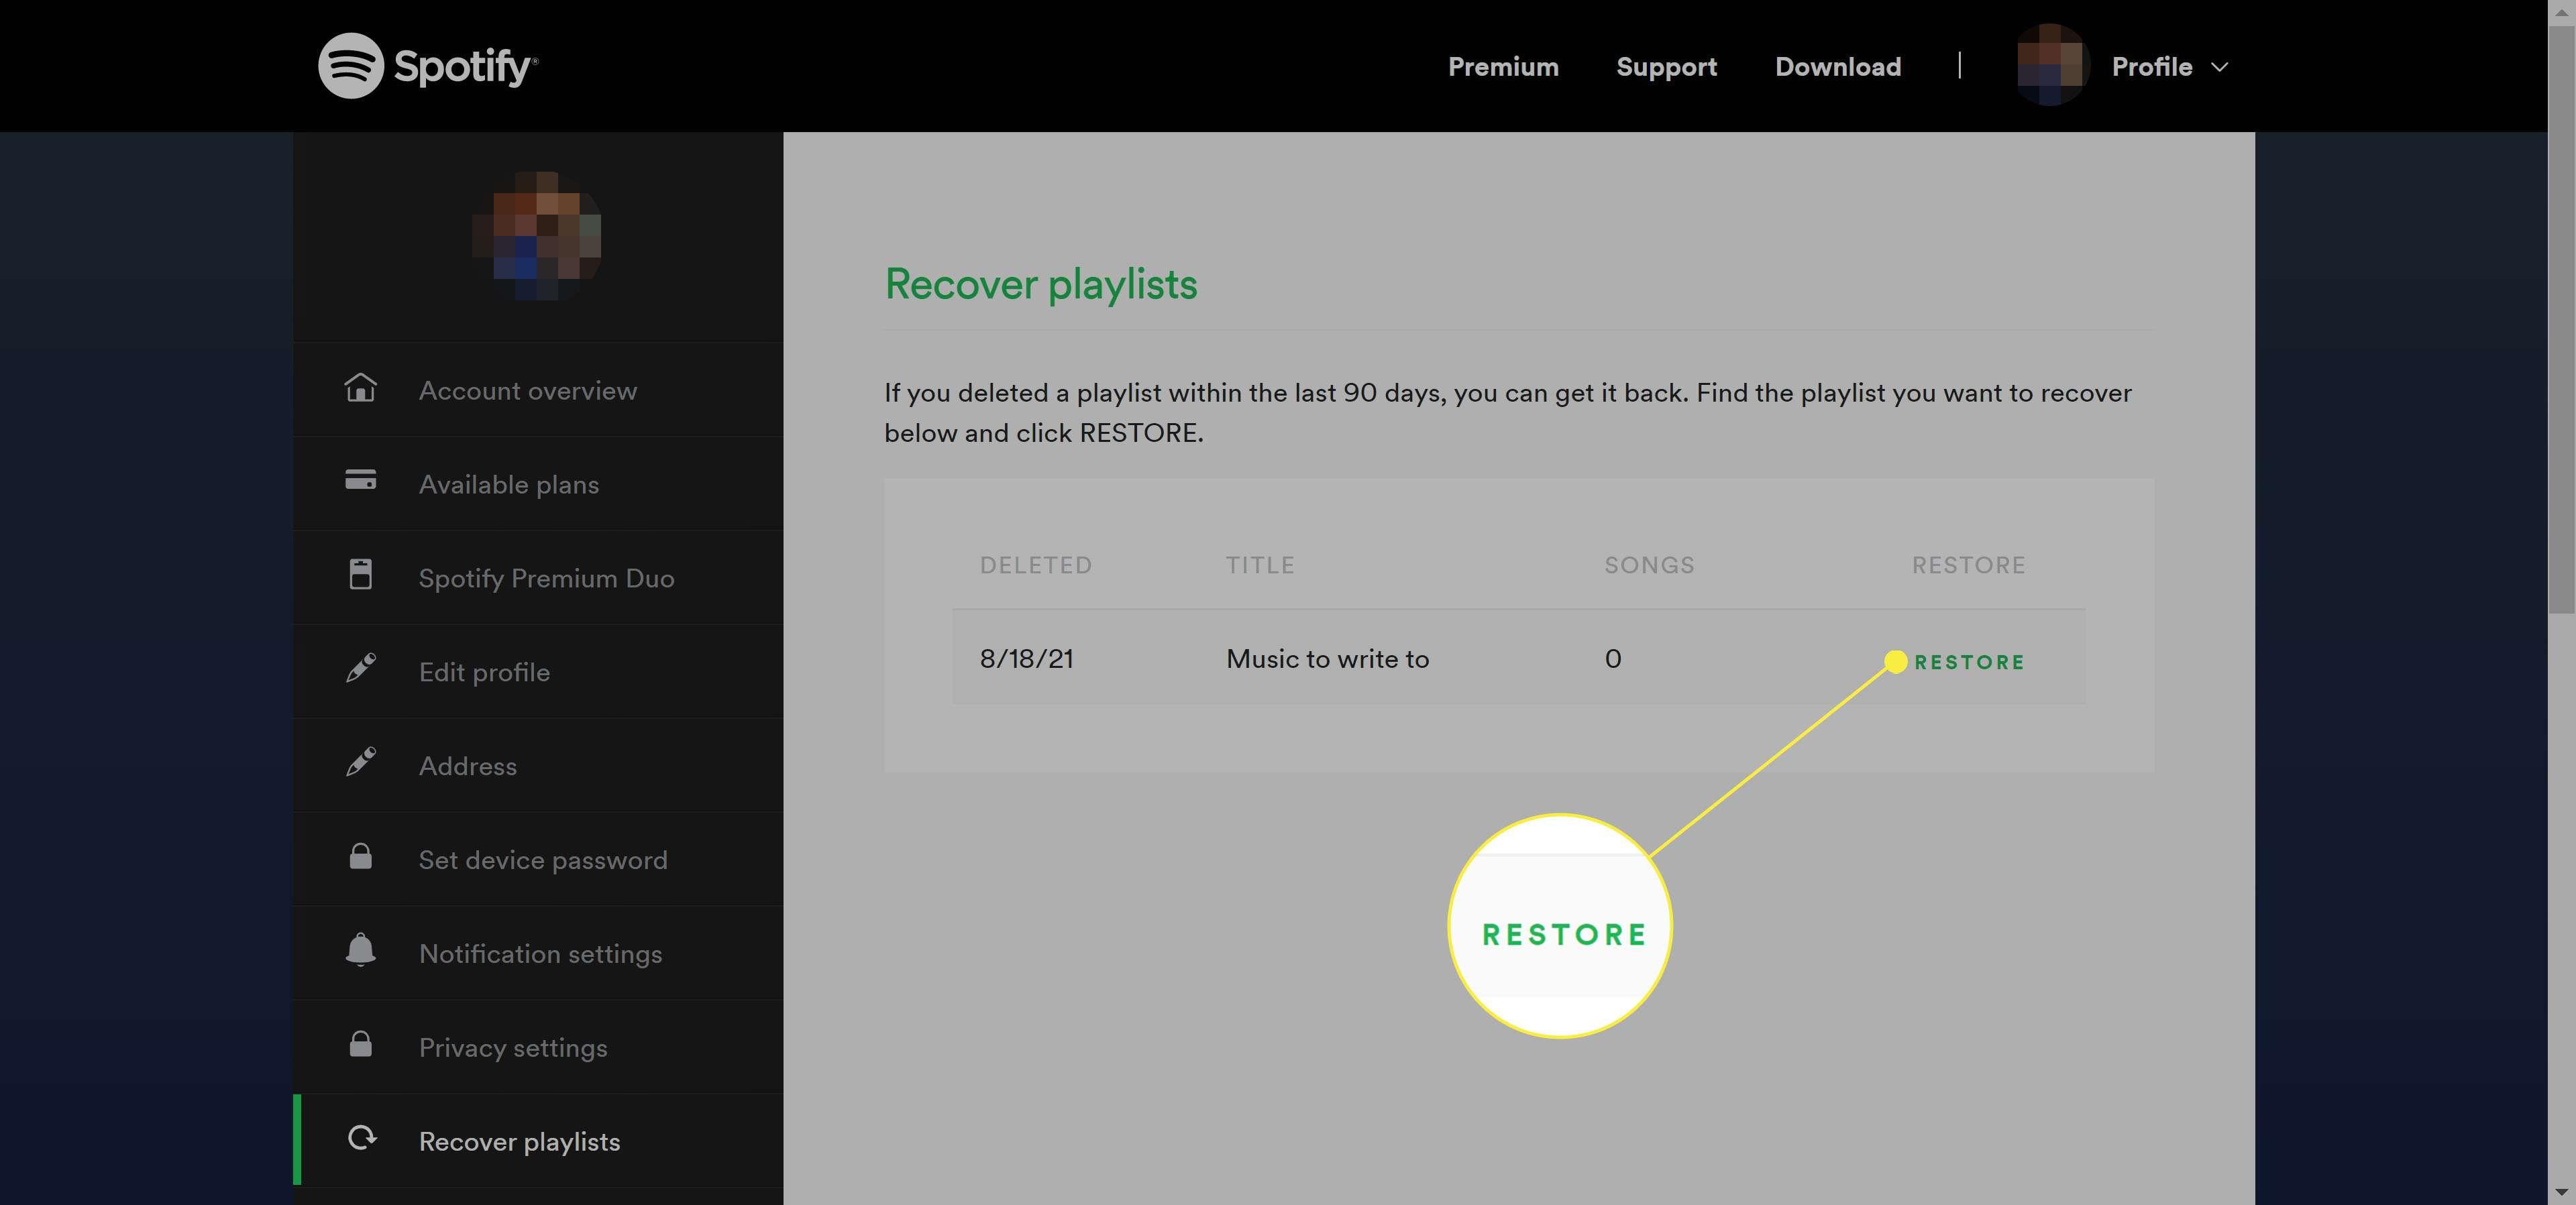 Spotify Restore Playlists web page.